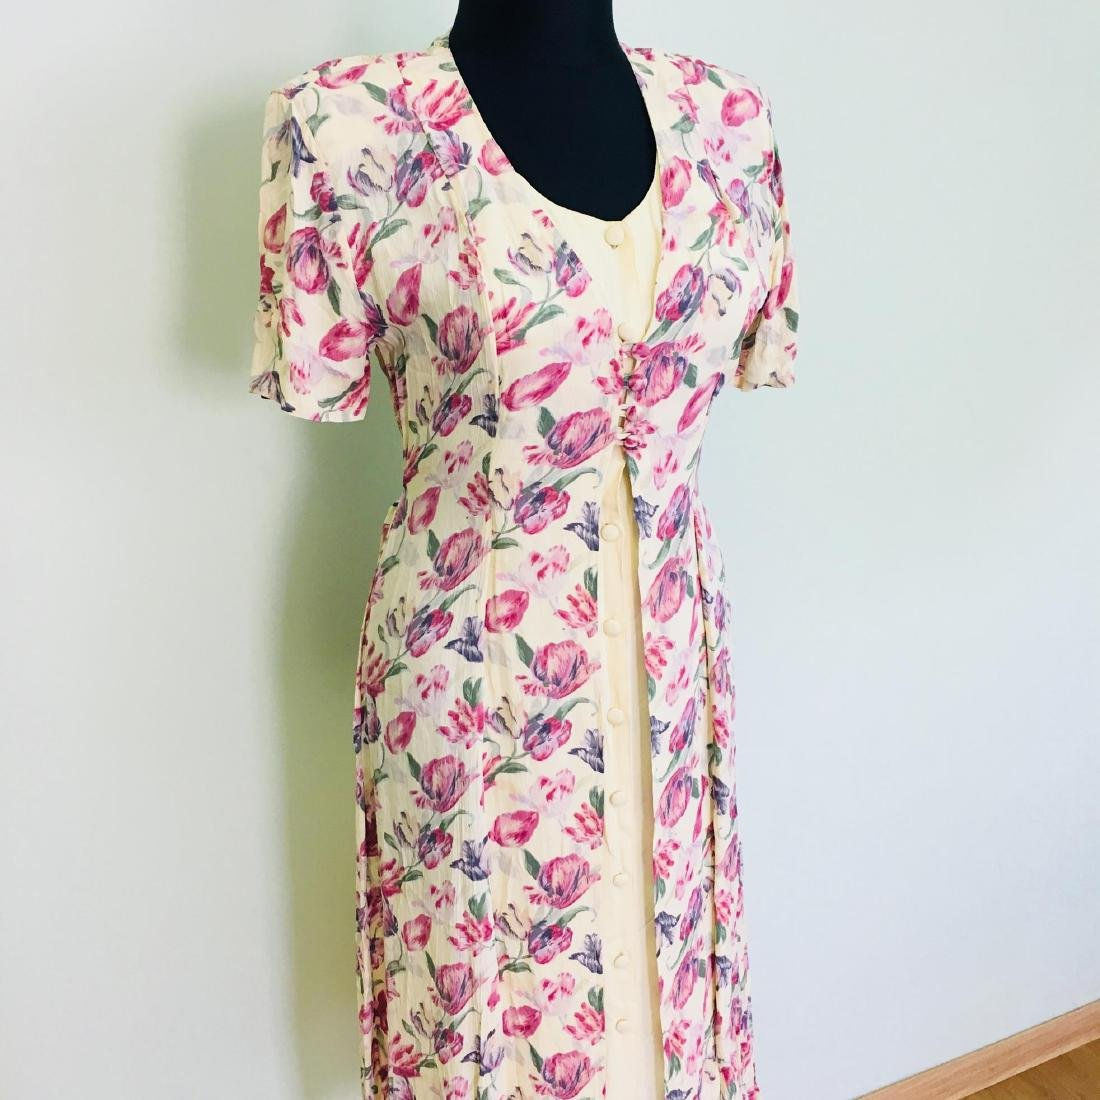 Vintage Women's Day Coctail Dress - 2